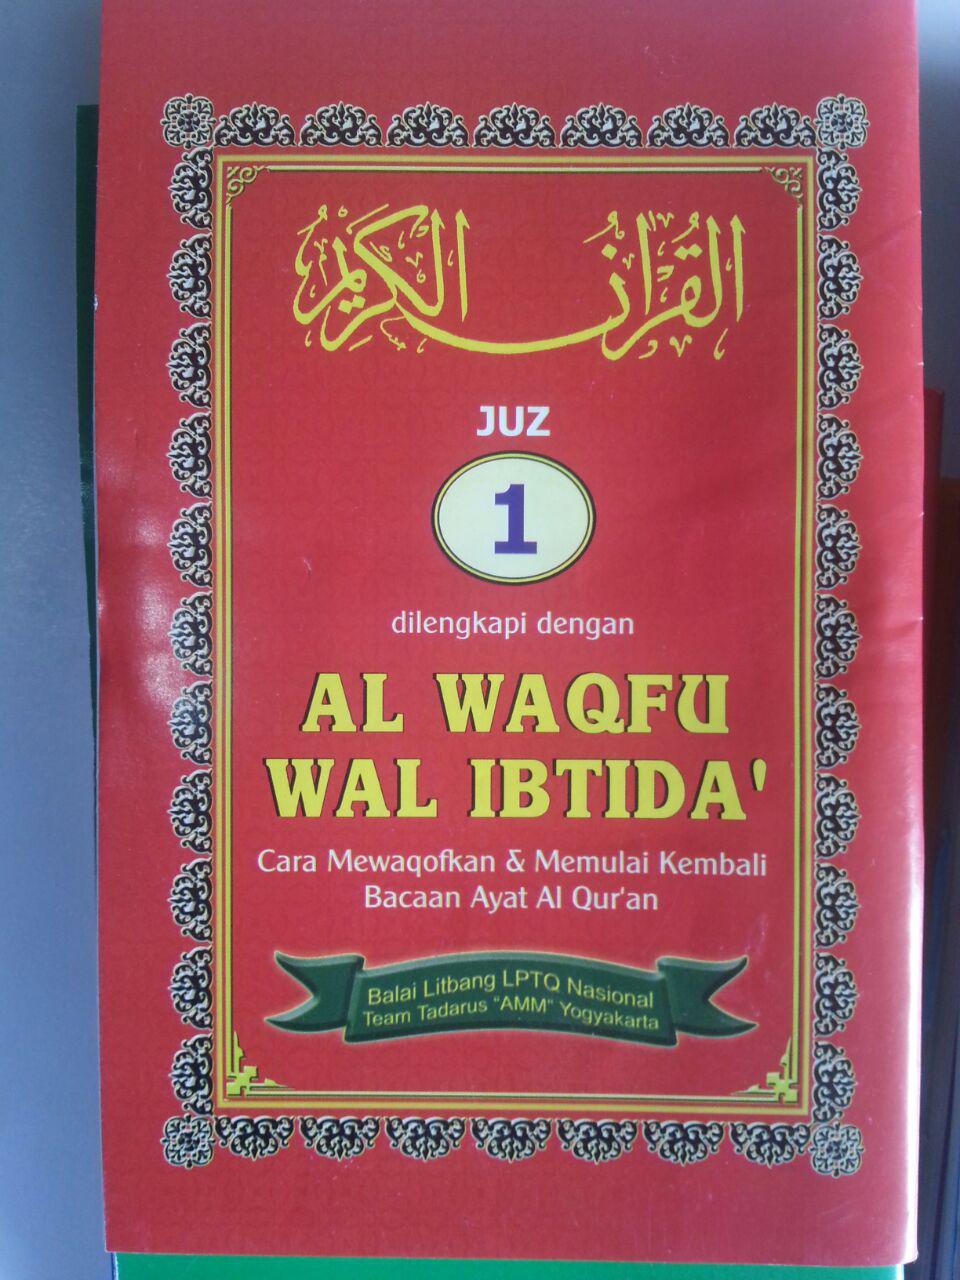 Al-Qur'an Al Waqfu Wal Ibtida Mewaqofkan Memulai Kembali Bacaan Al Quran Set cover 2